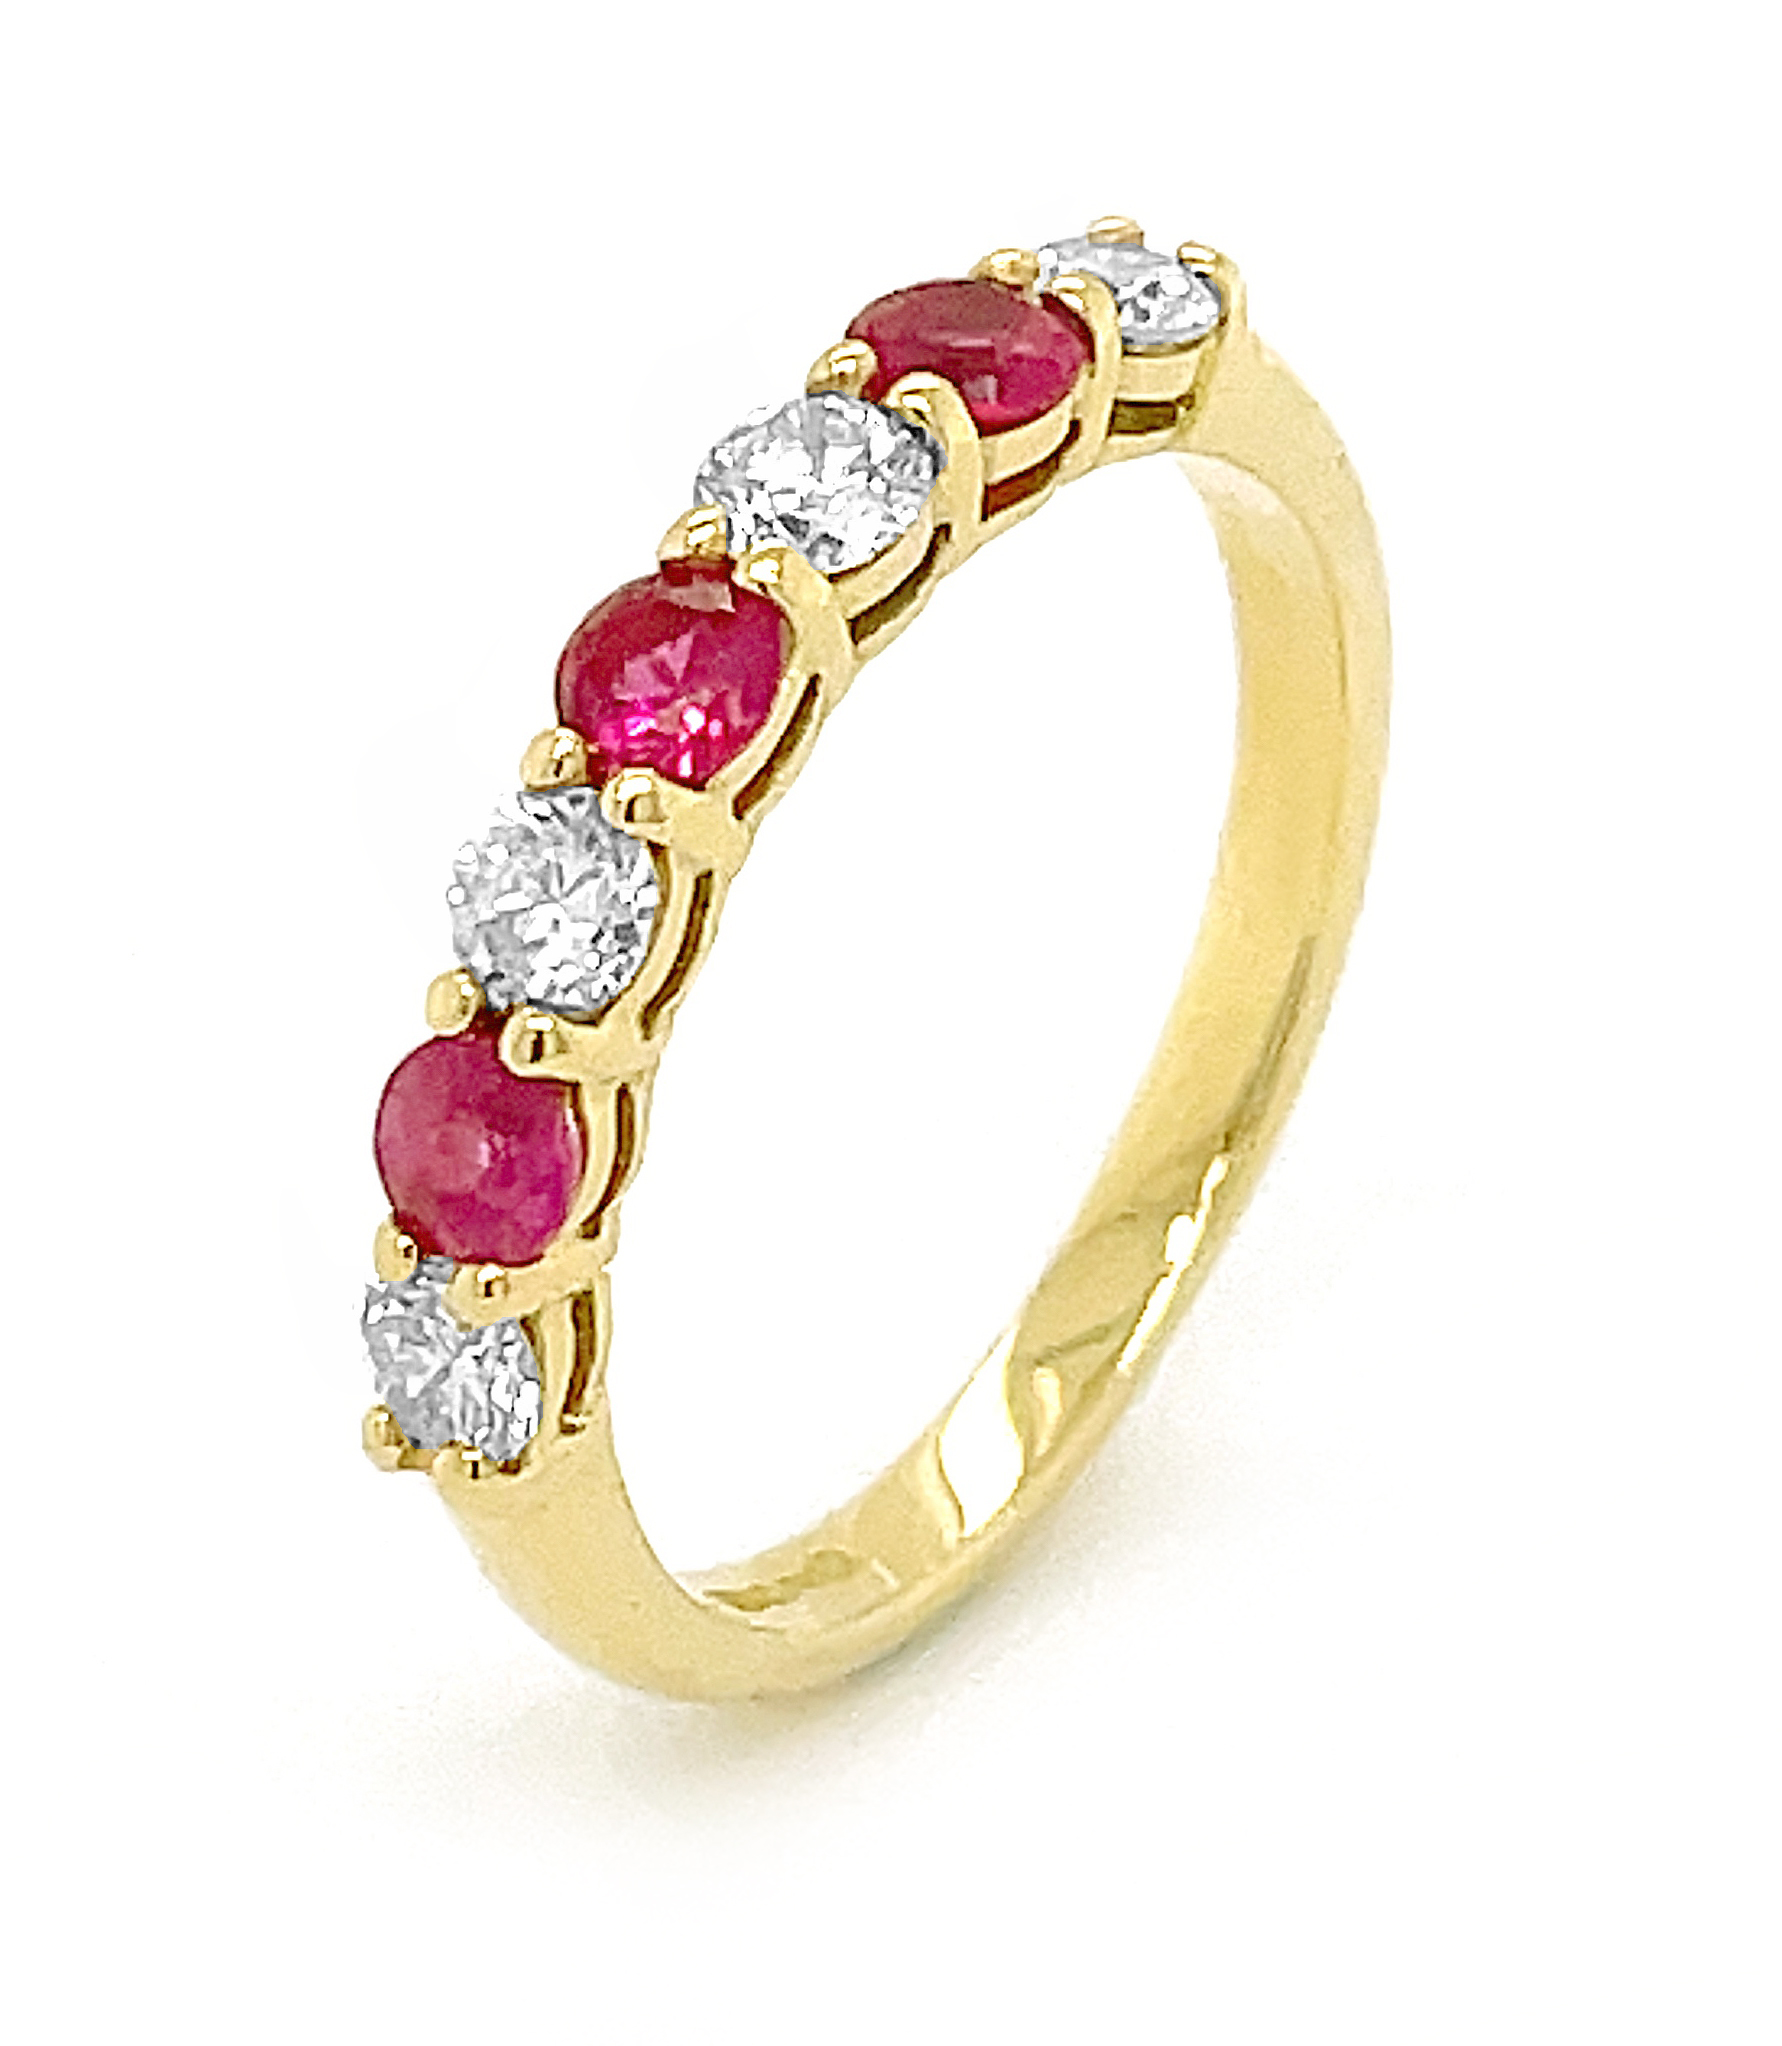 18k Yellow Gold 7 Stone Round Ruby & Brilliant Cut Diamond Ring